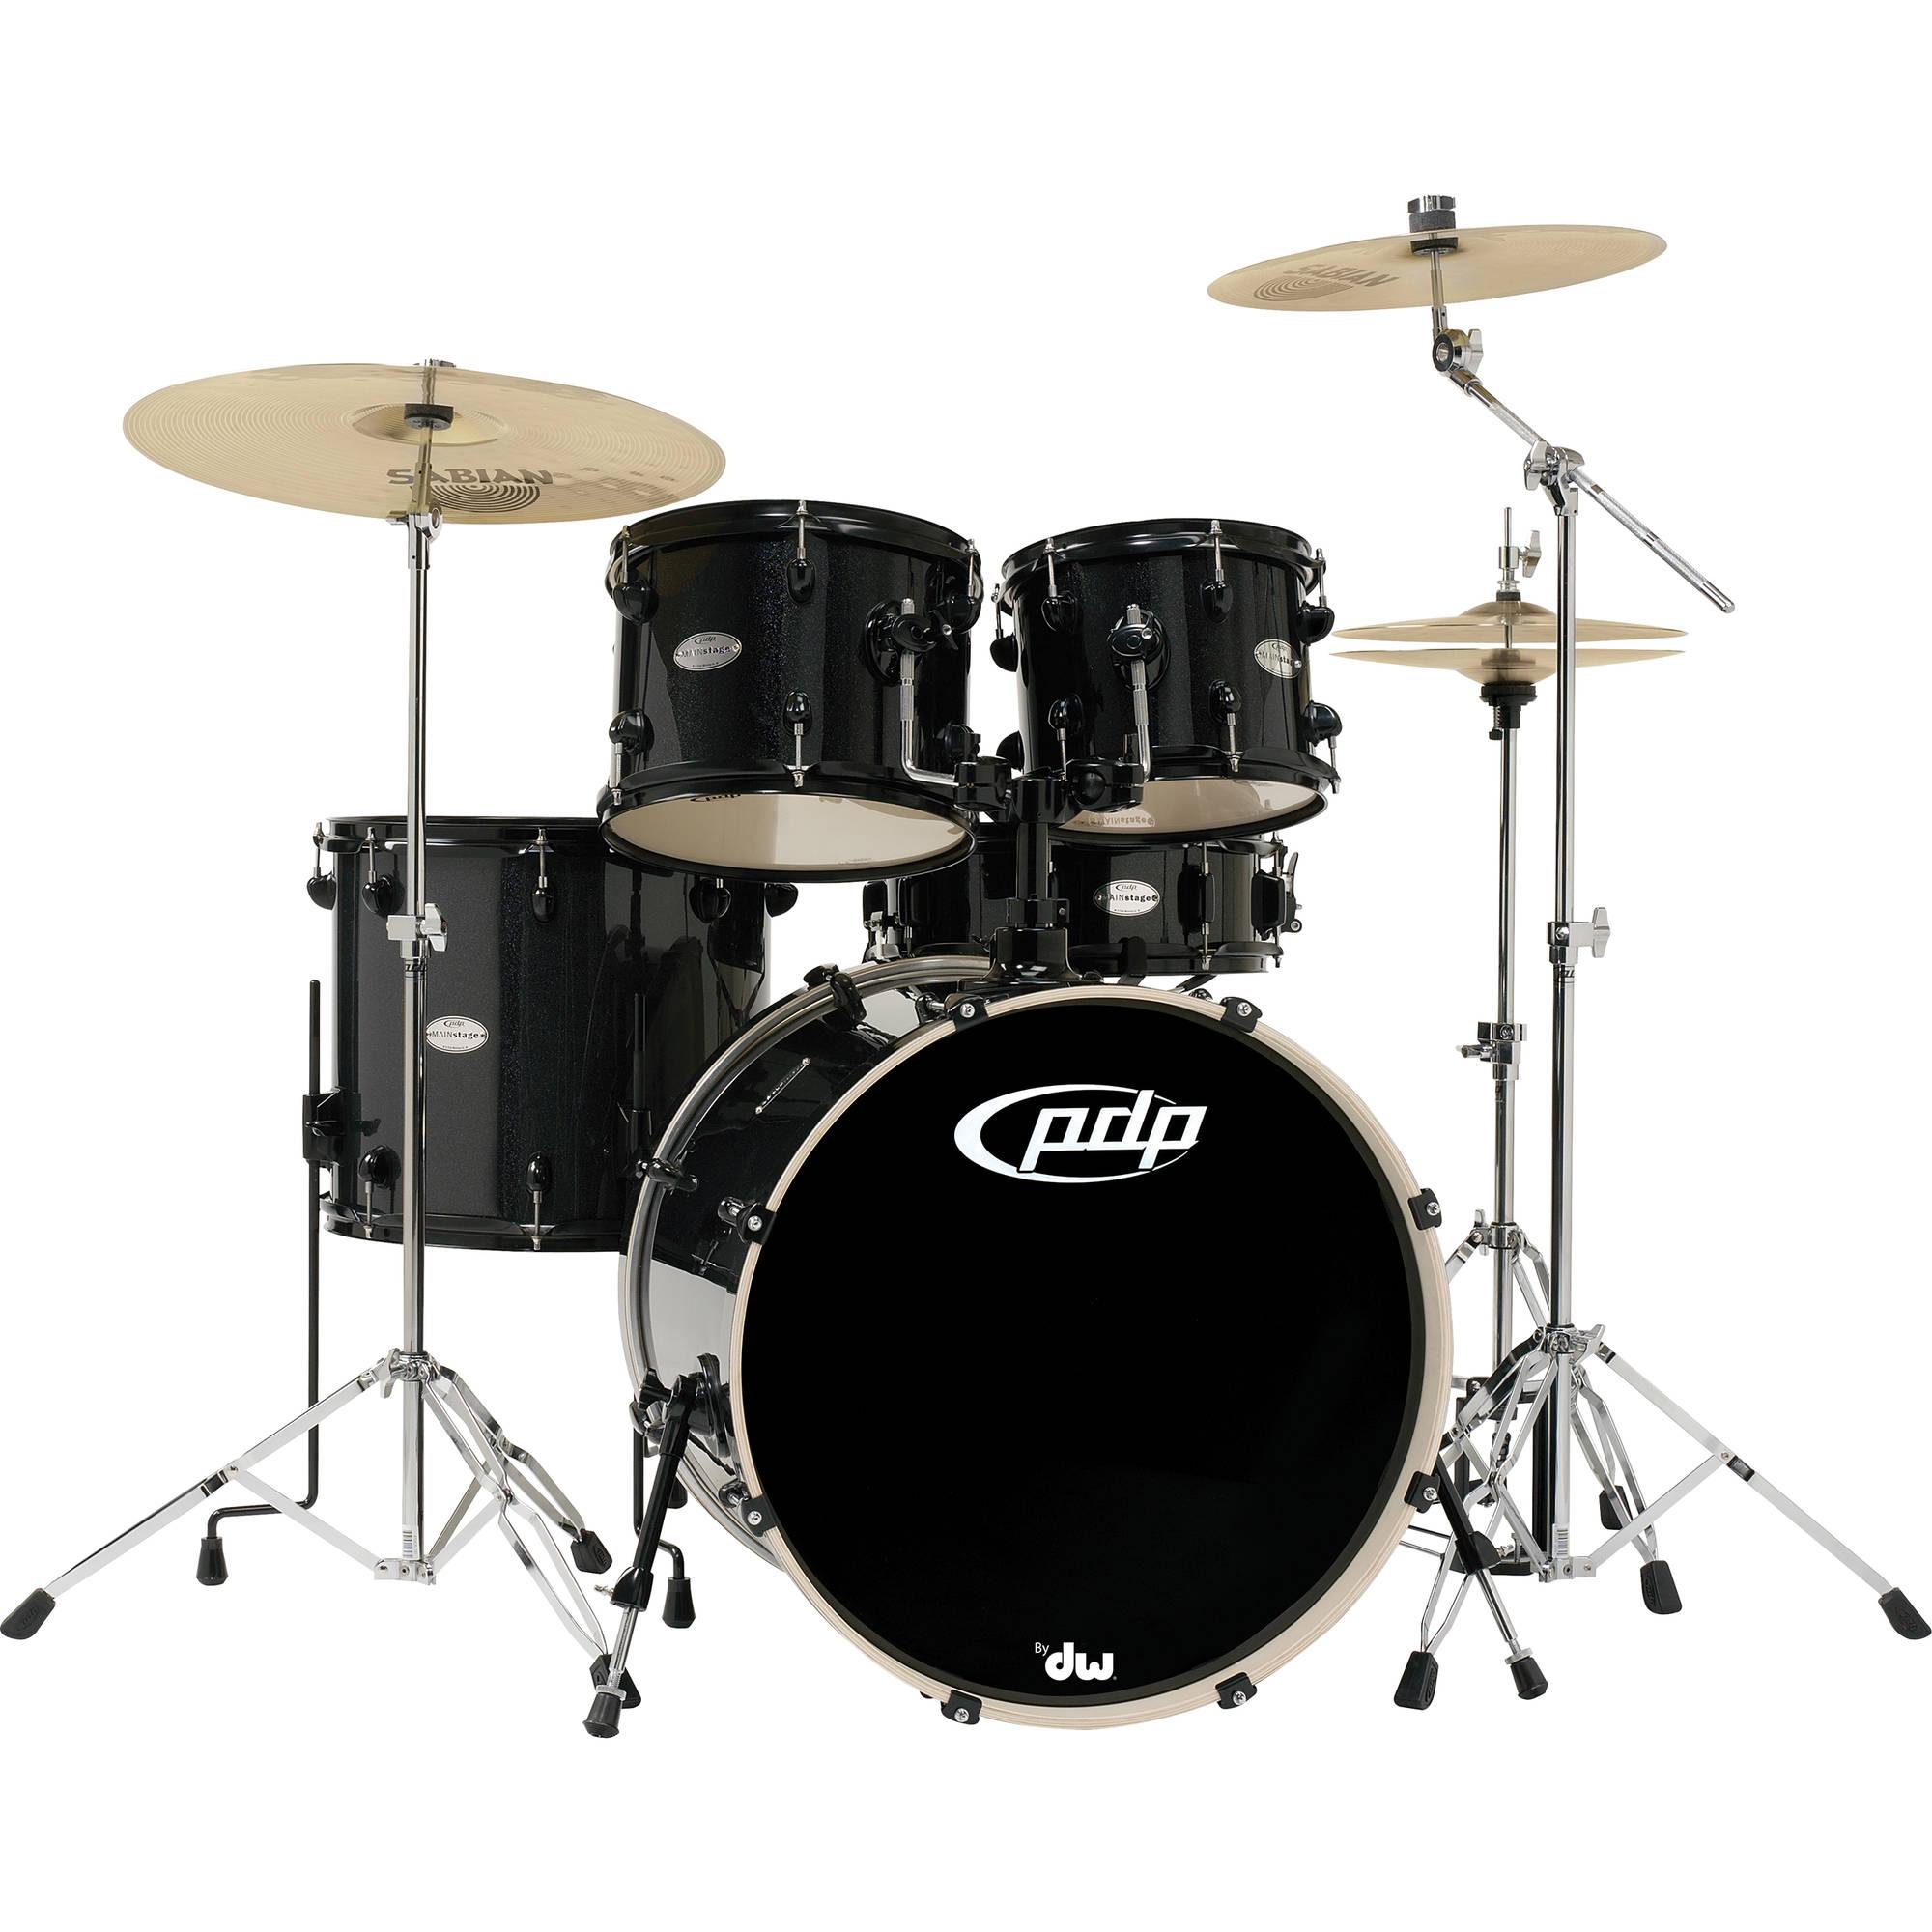 PDP Mainstage 5-Piece Drum Kit w/800 Hardware and Zildjian Cymbals (Black  Metallic)